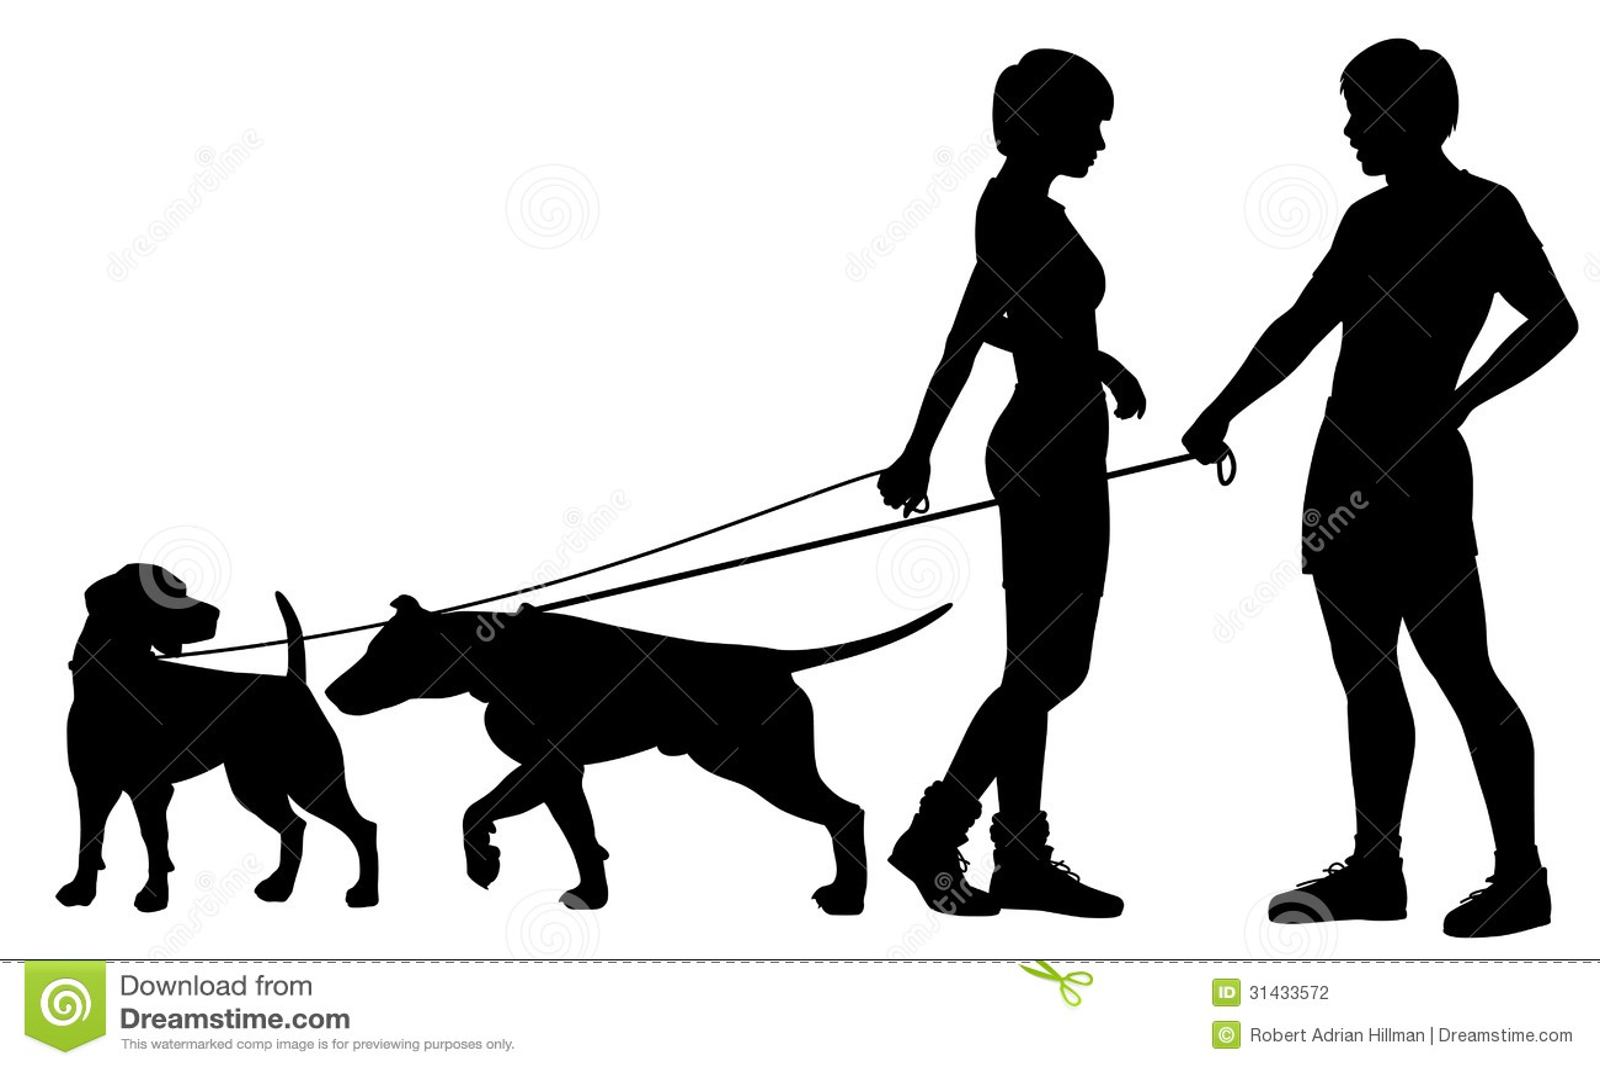 狗和人�y�'��)�al�����:)�h�_download 狗人聊天 向量例证.